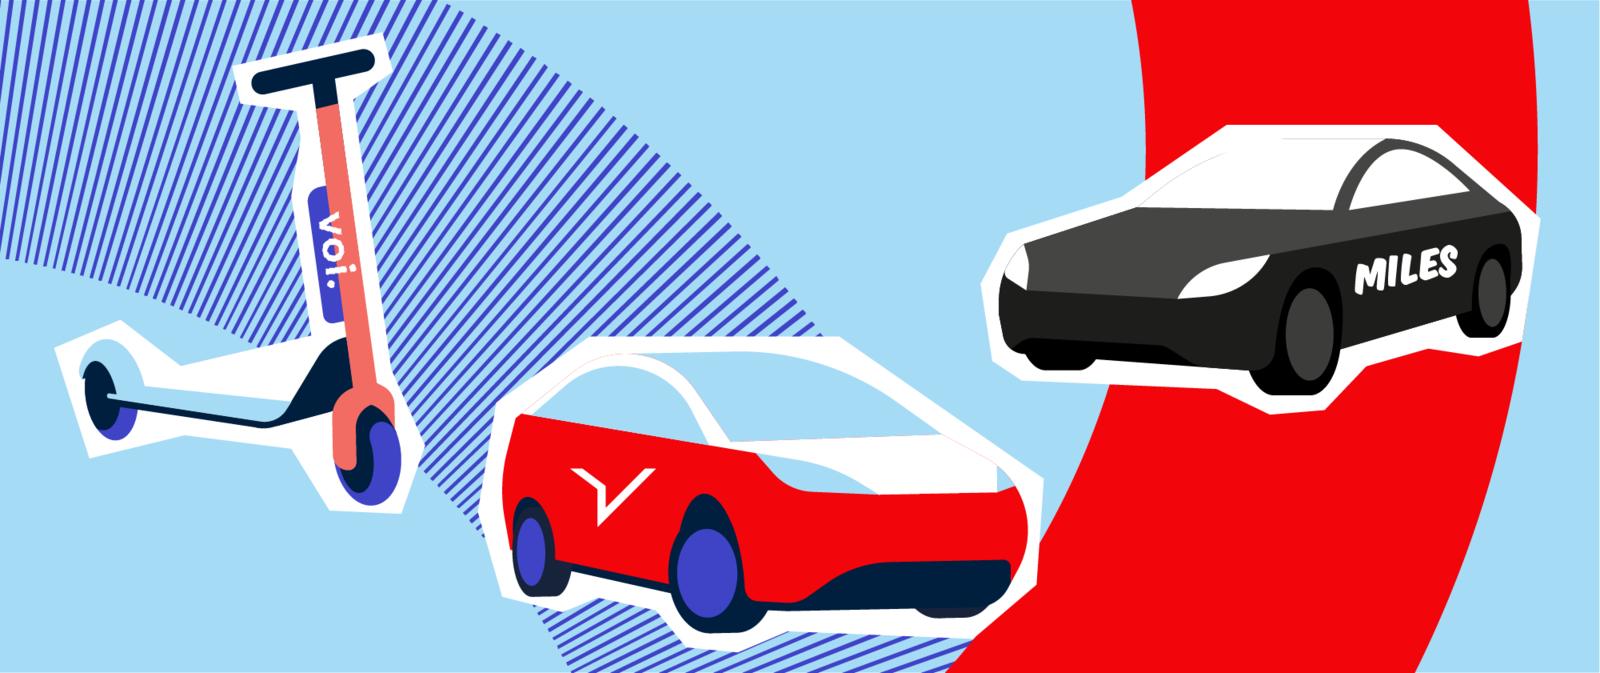 Kostenlos Miles Carsharing